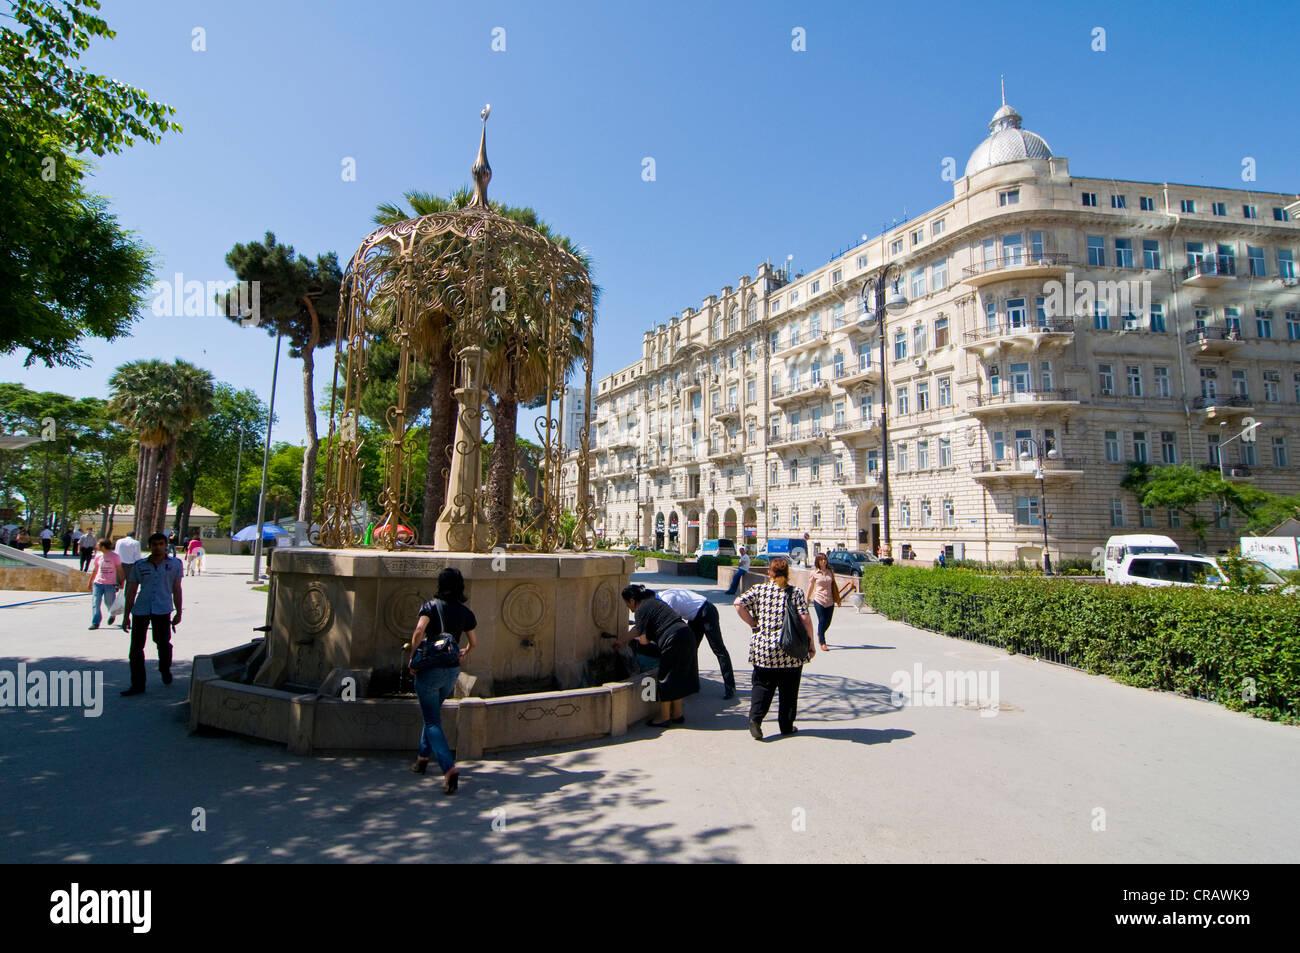 Historic old town, UNESCO World Heritage Site, Baku, Azerbaijan, Caucasus, Middle East - Stock Image